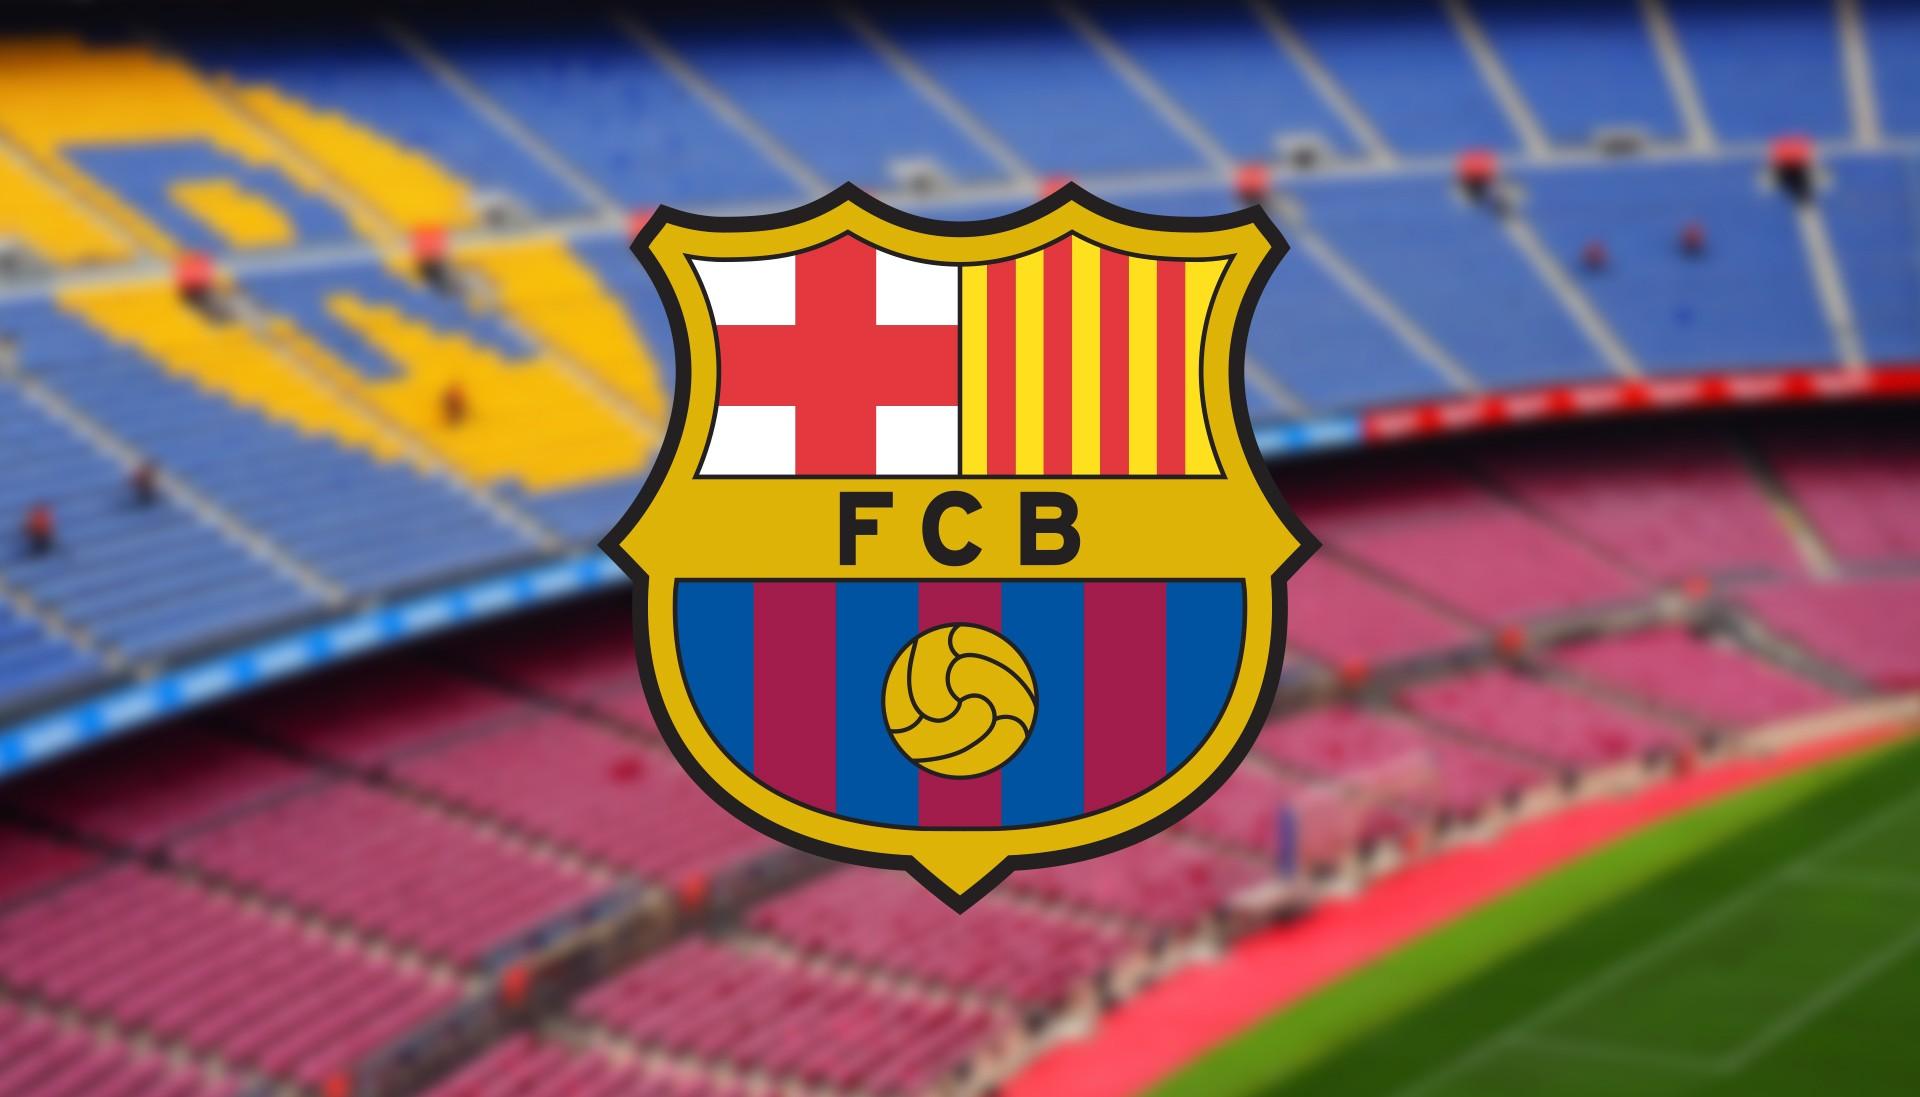 fc-barcelona-grid-image